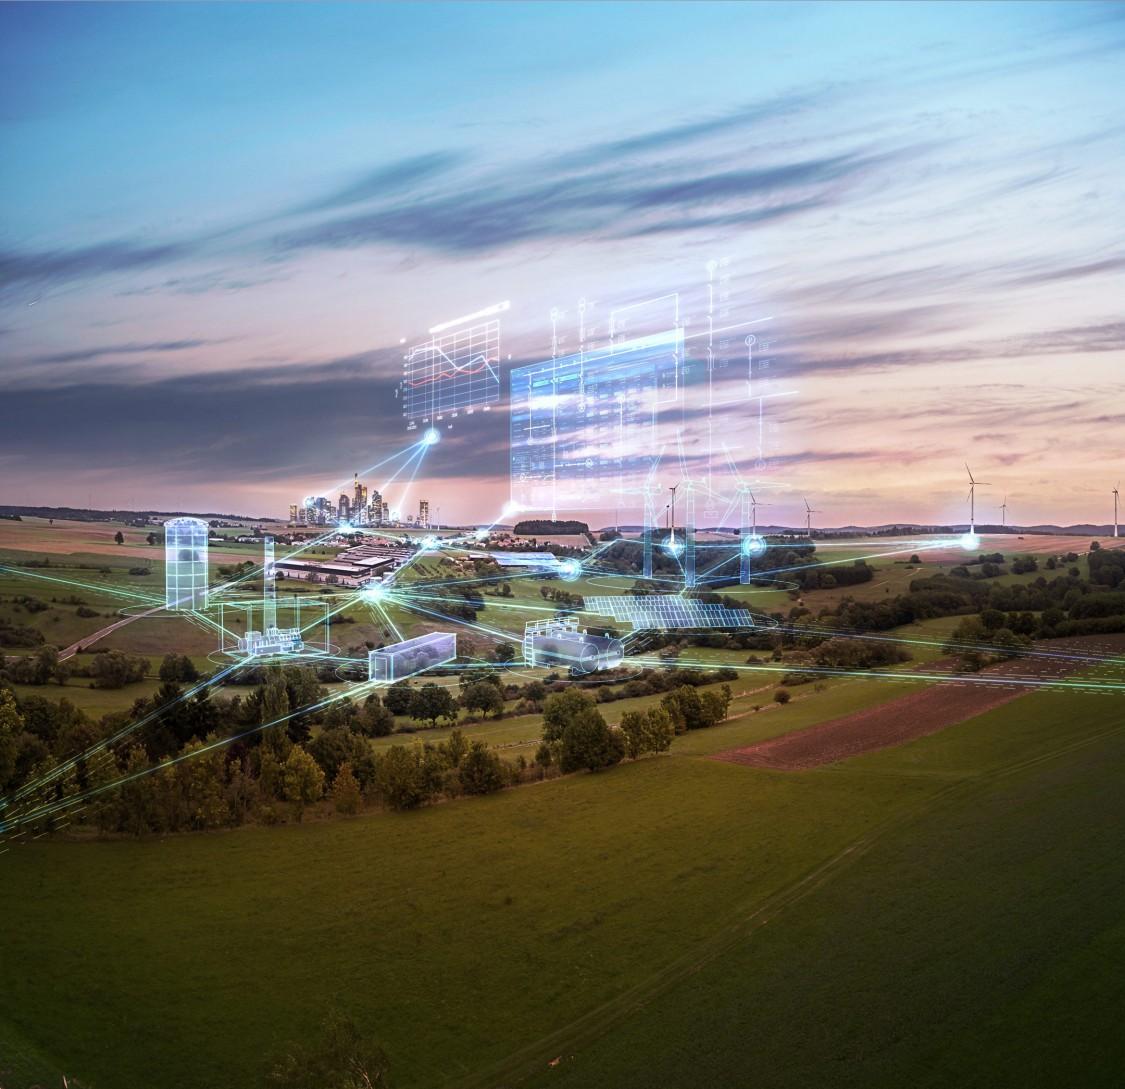 Siemens electric energy